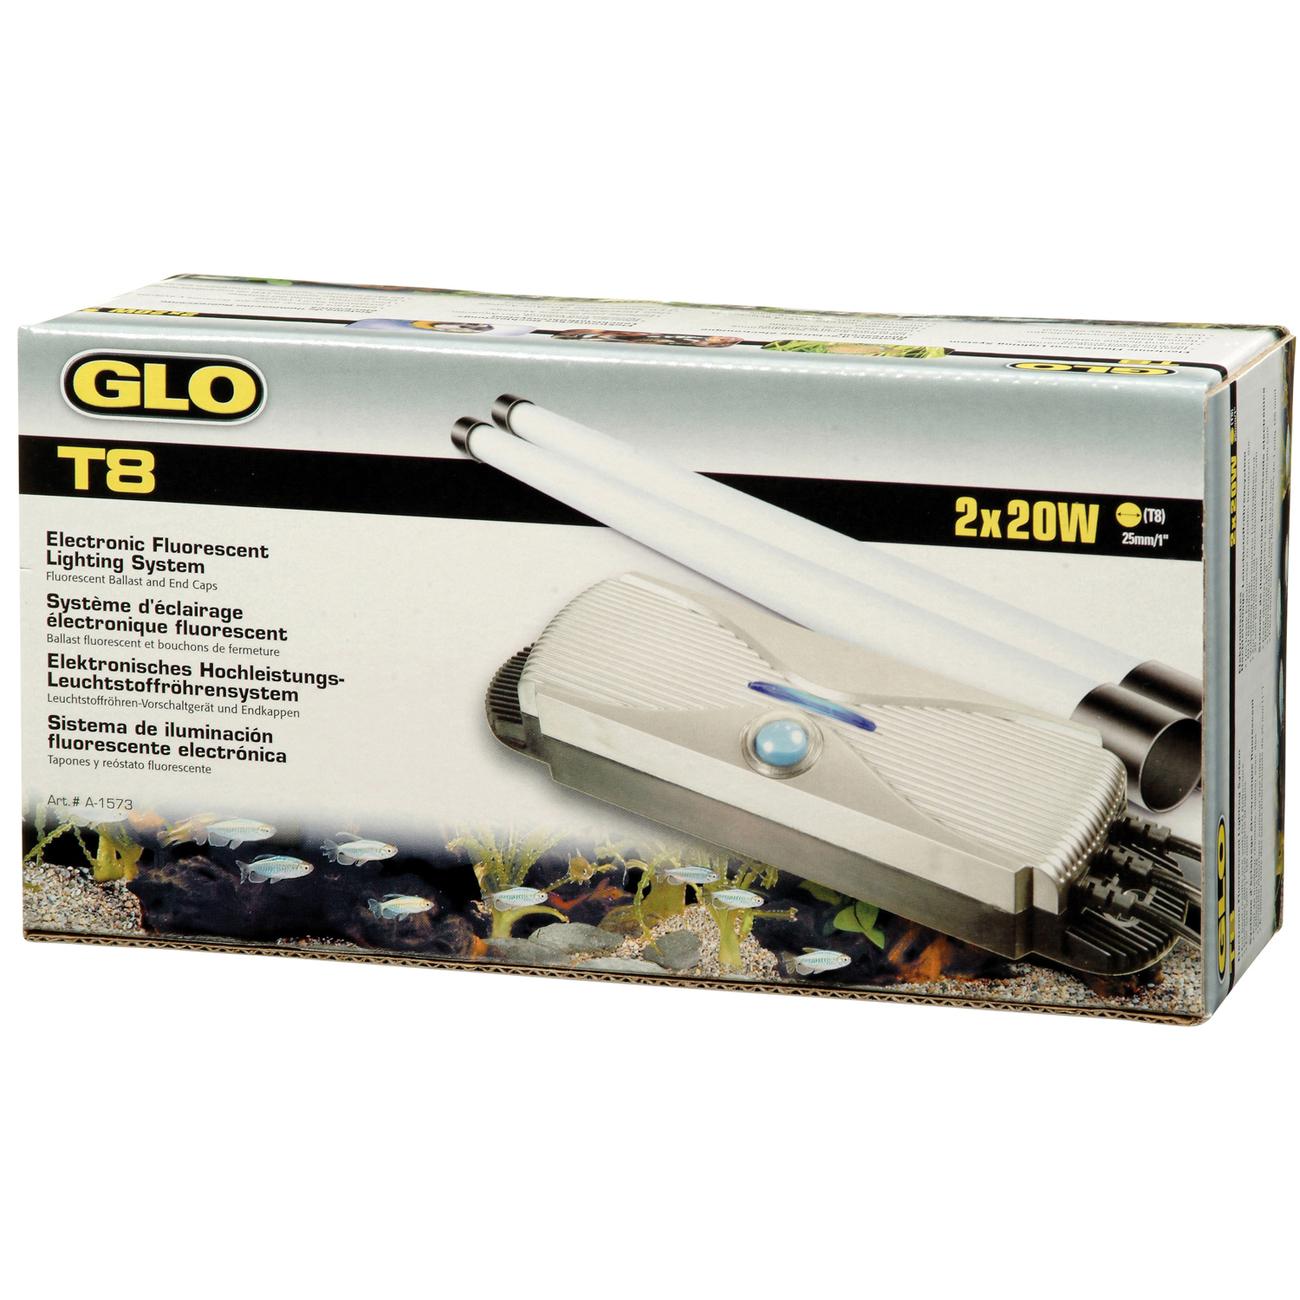 GLO Vorschaltgerät T8, Bild 4